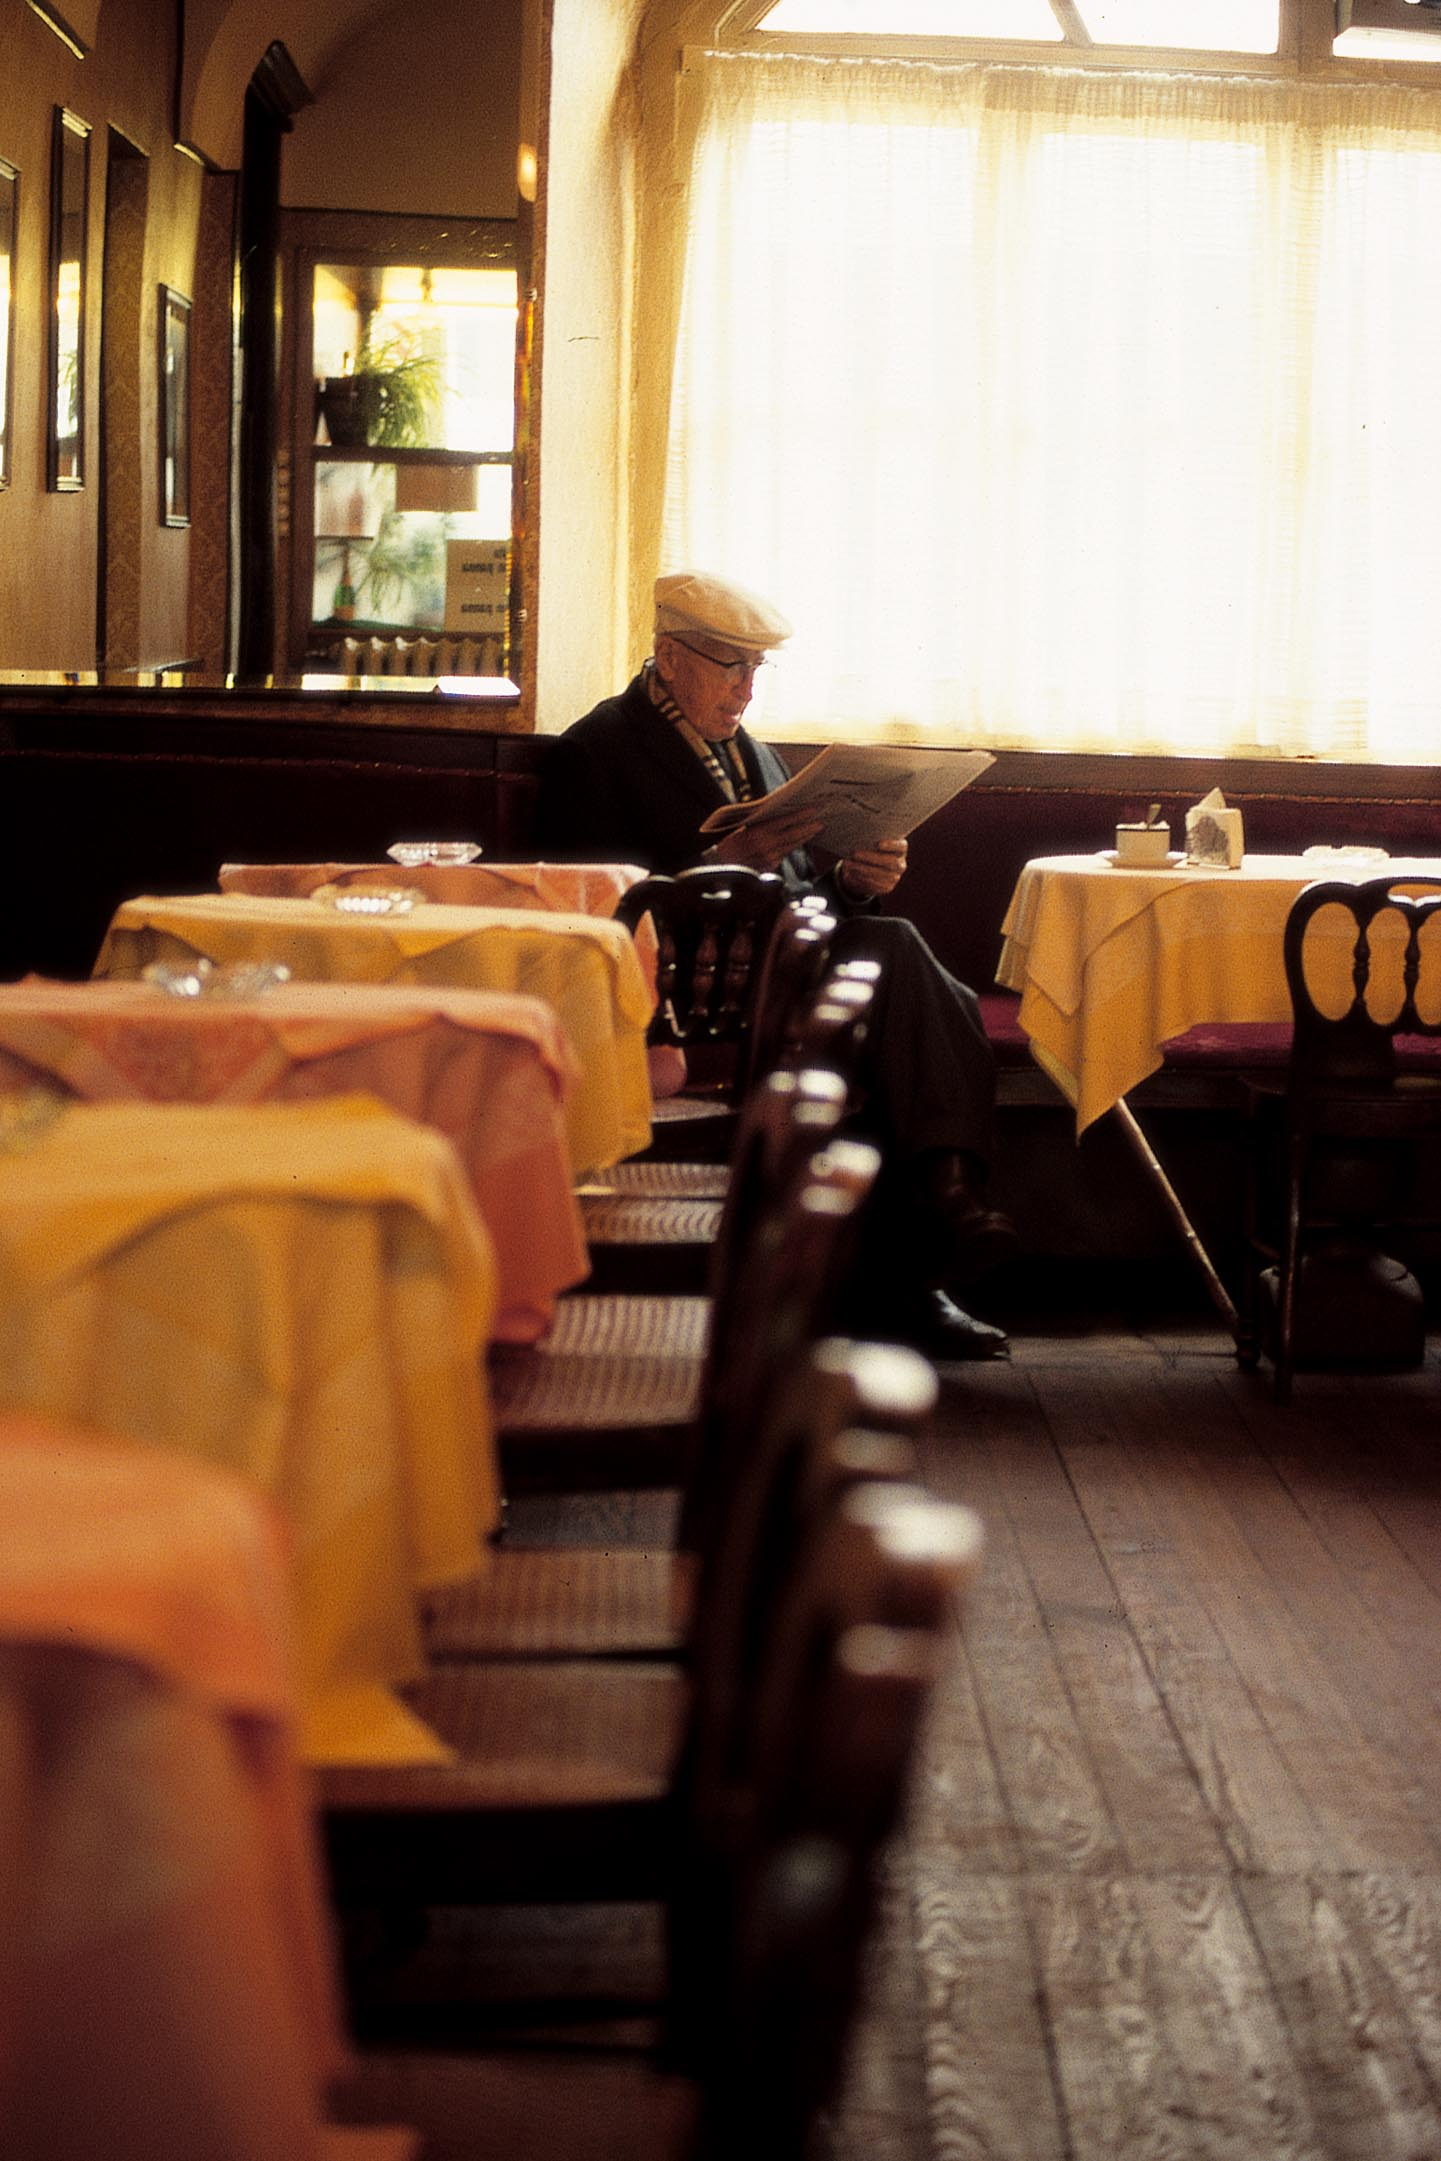 Caffè storico/Historic coffe bar